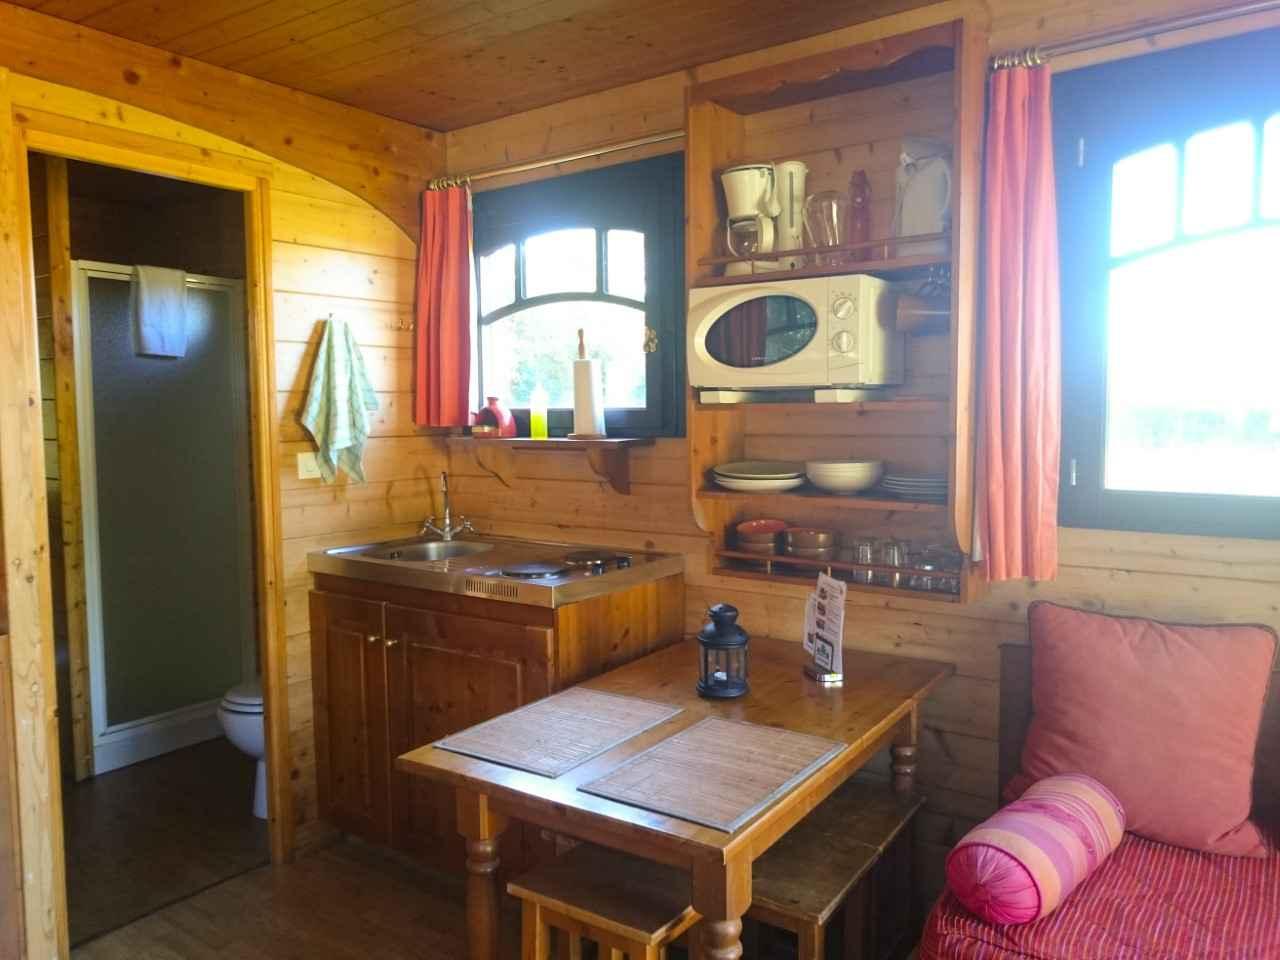 roulotte bouton d 39 or roulotte en centre cabanes de france. Black Bedroom Furniture Sets. Home Design Ideas